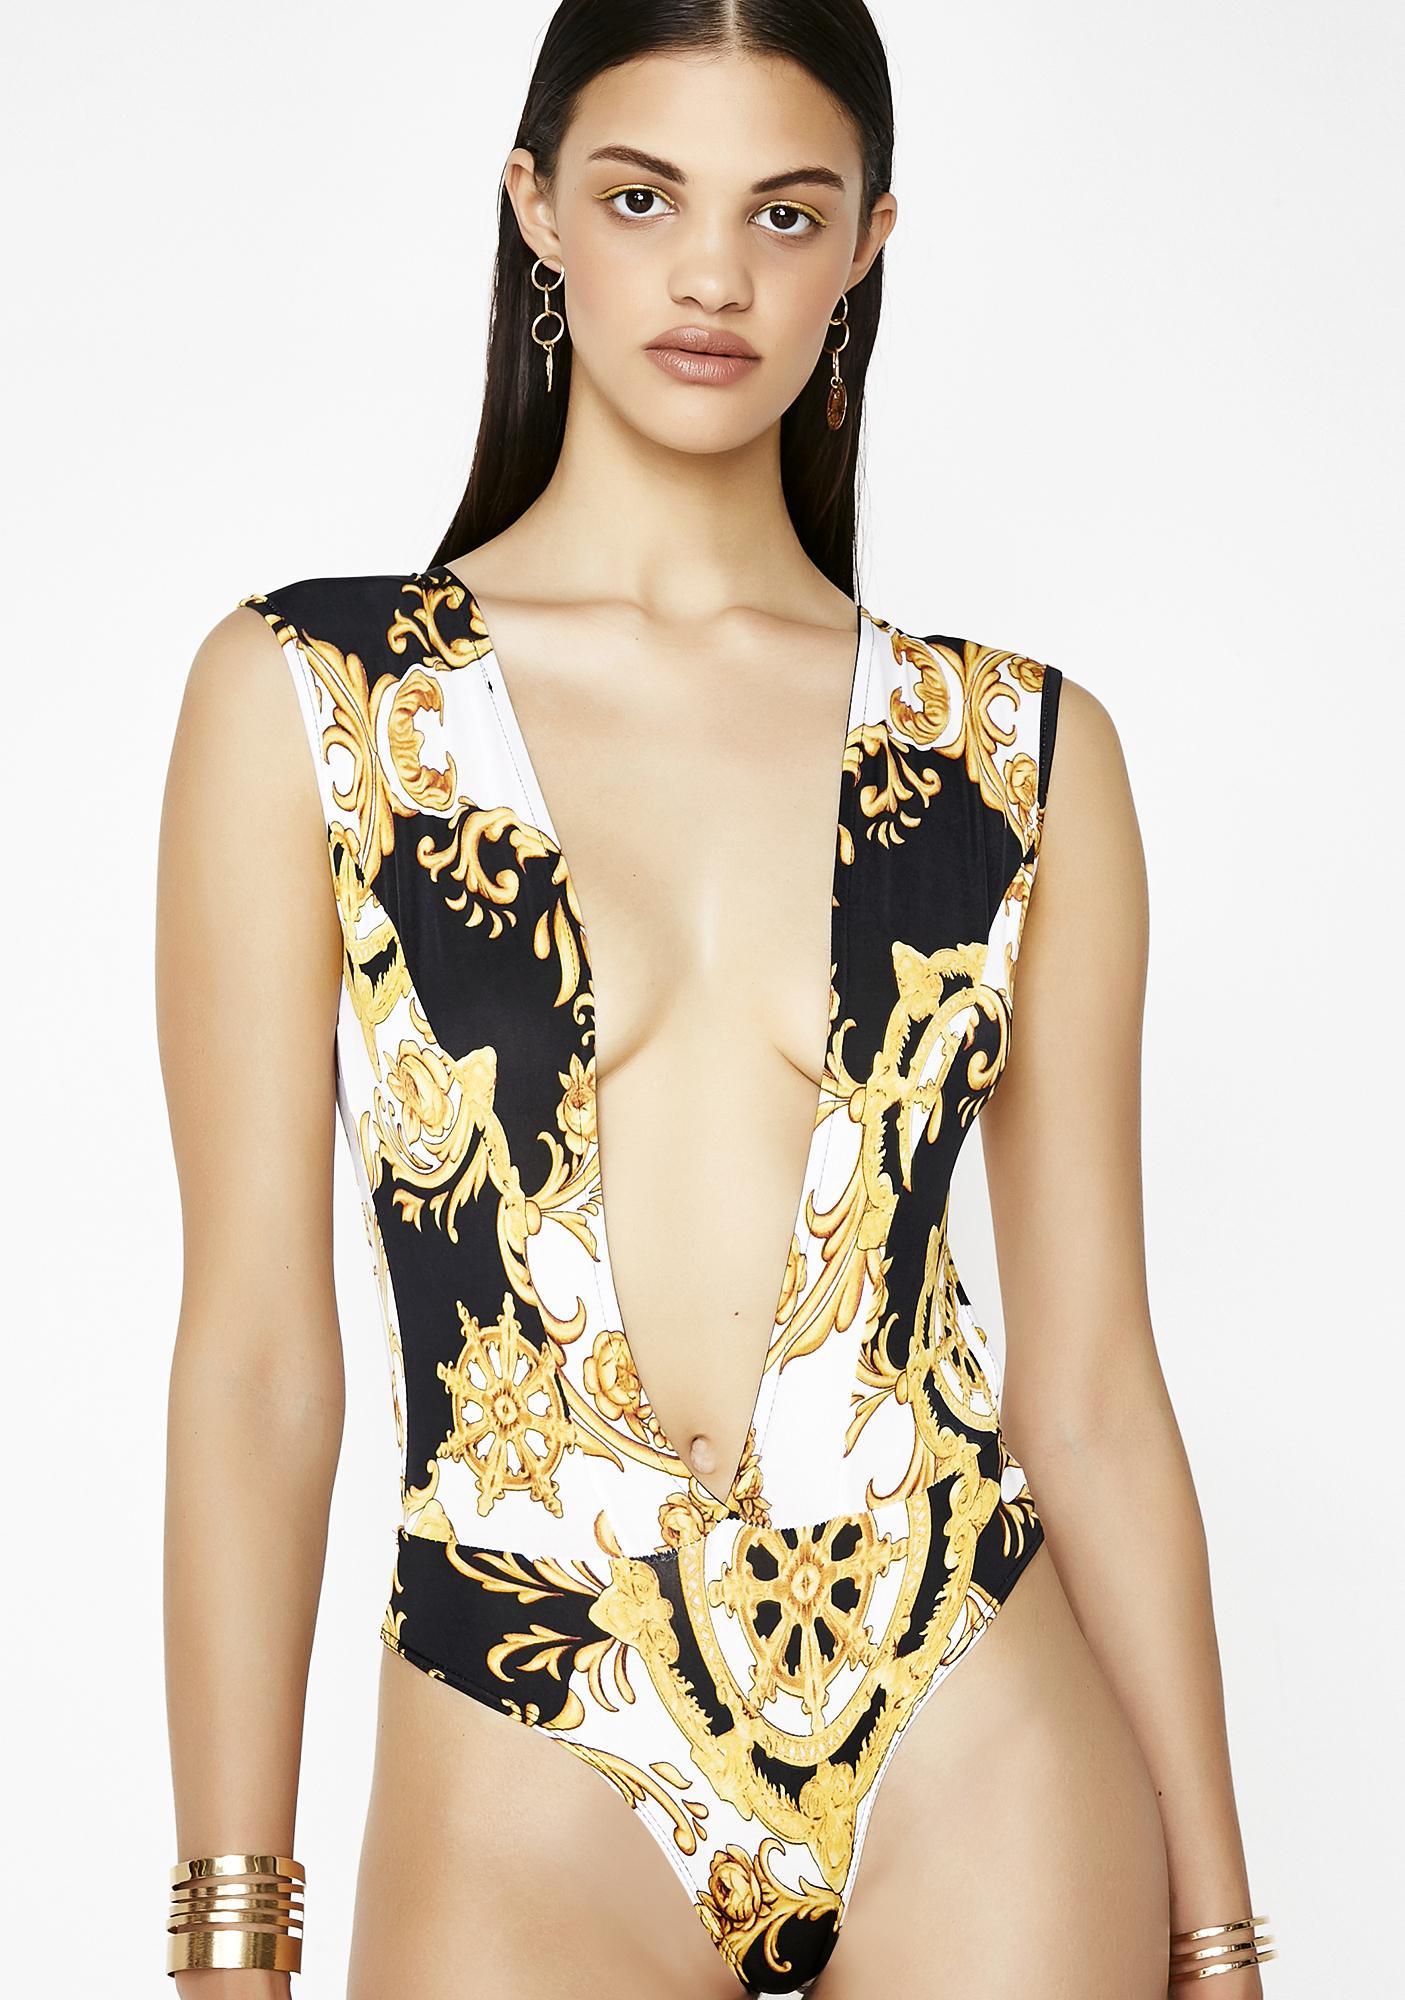 Xpensive Taste Printed Bodysuit